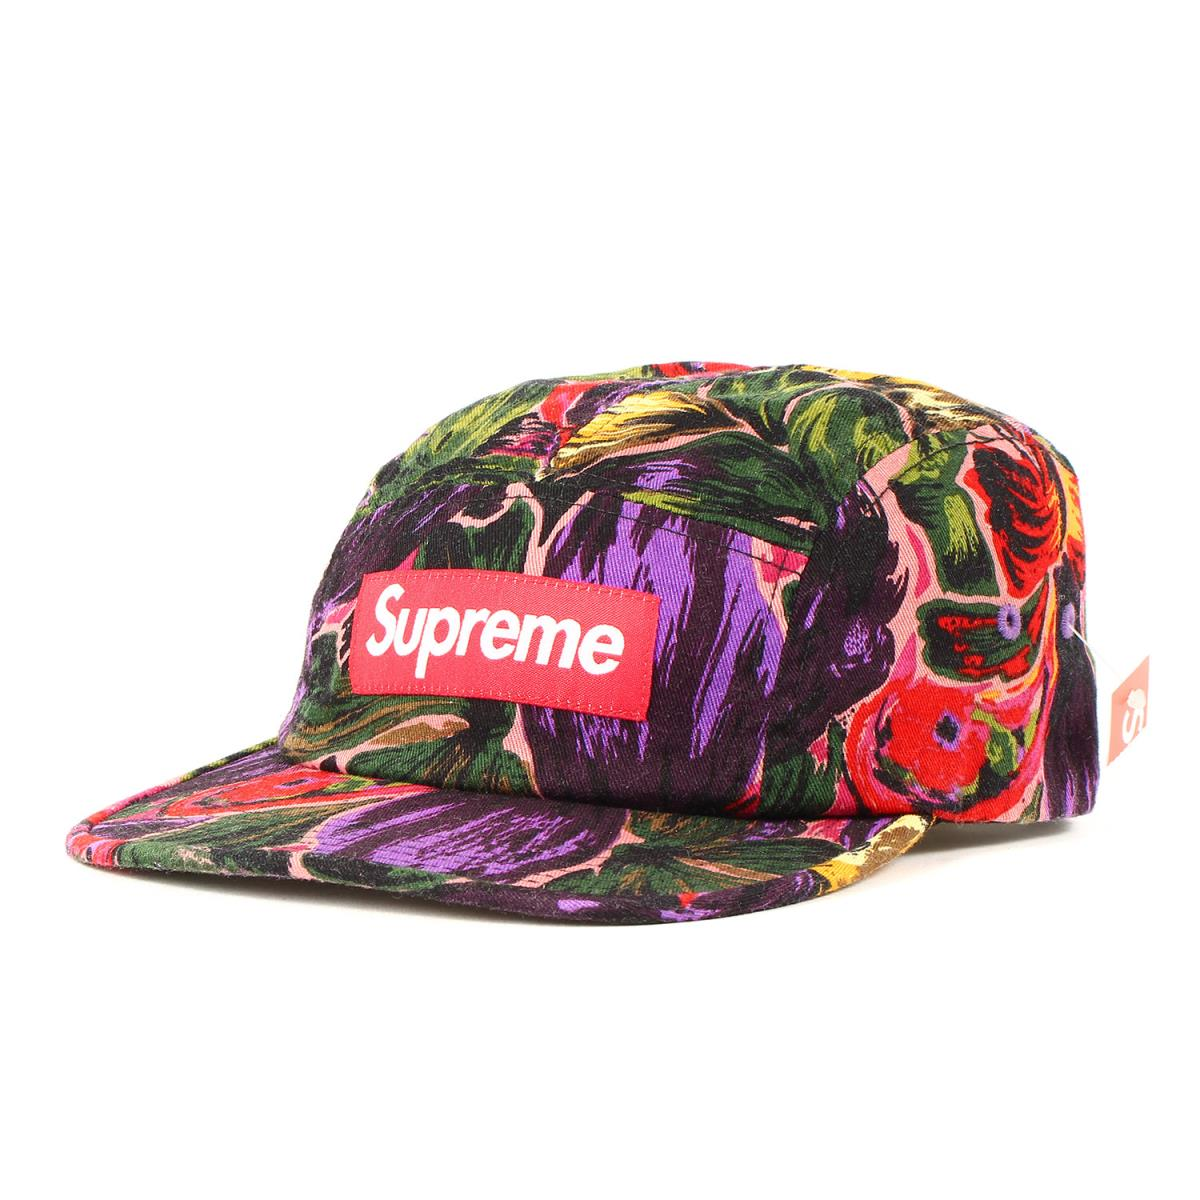 Supreme シュプリーム キャップ フローラル BOXロゴ キャンプキャップ Painted Floral Camp Cap 17AW パープル 【メンズ】【K2607】